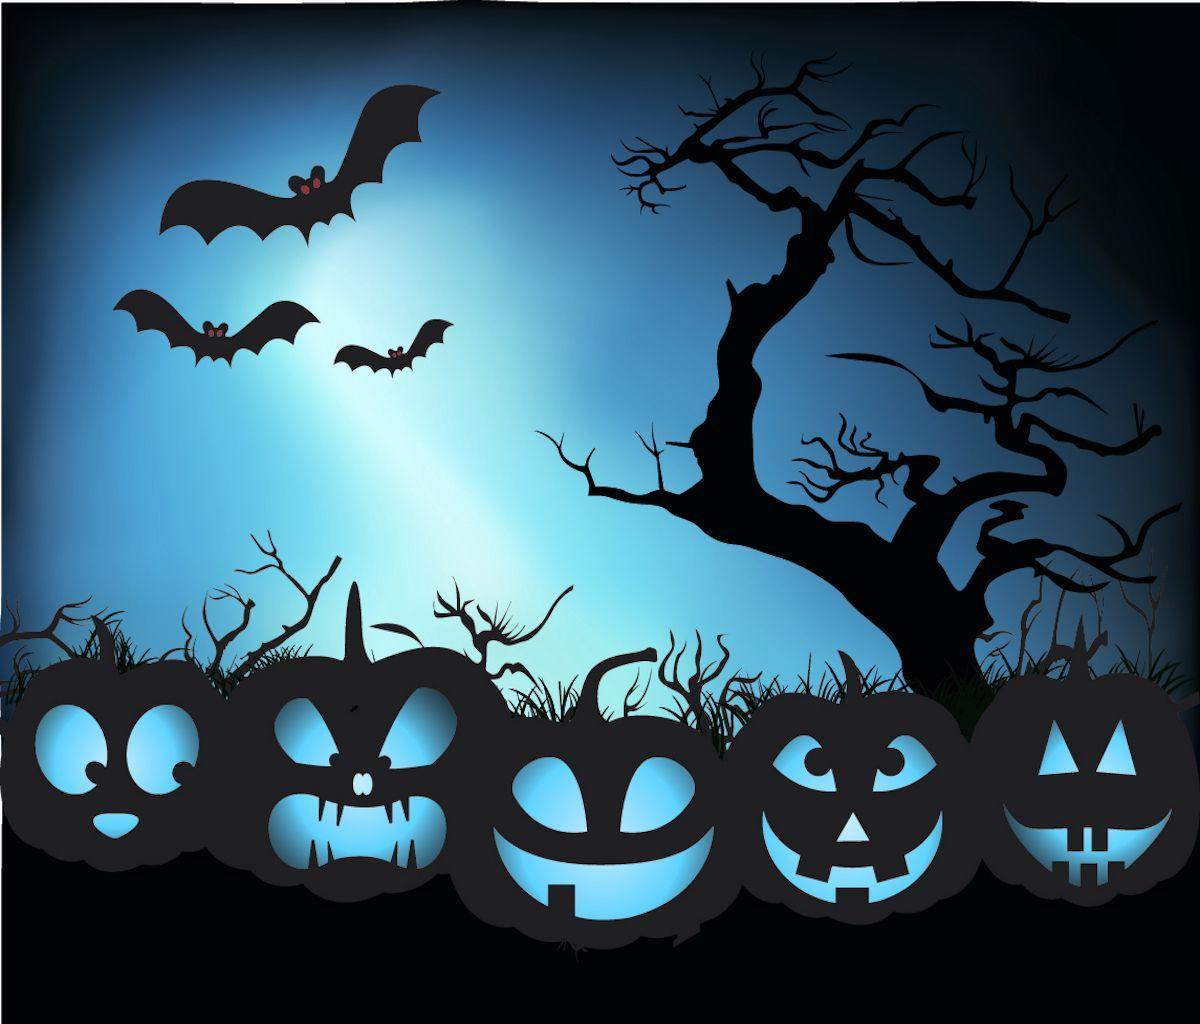 Halloween Tablet Wallpapers - Top Free